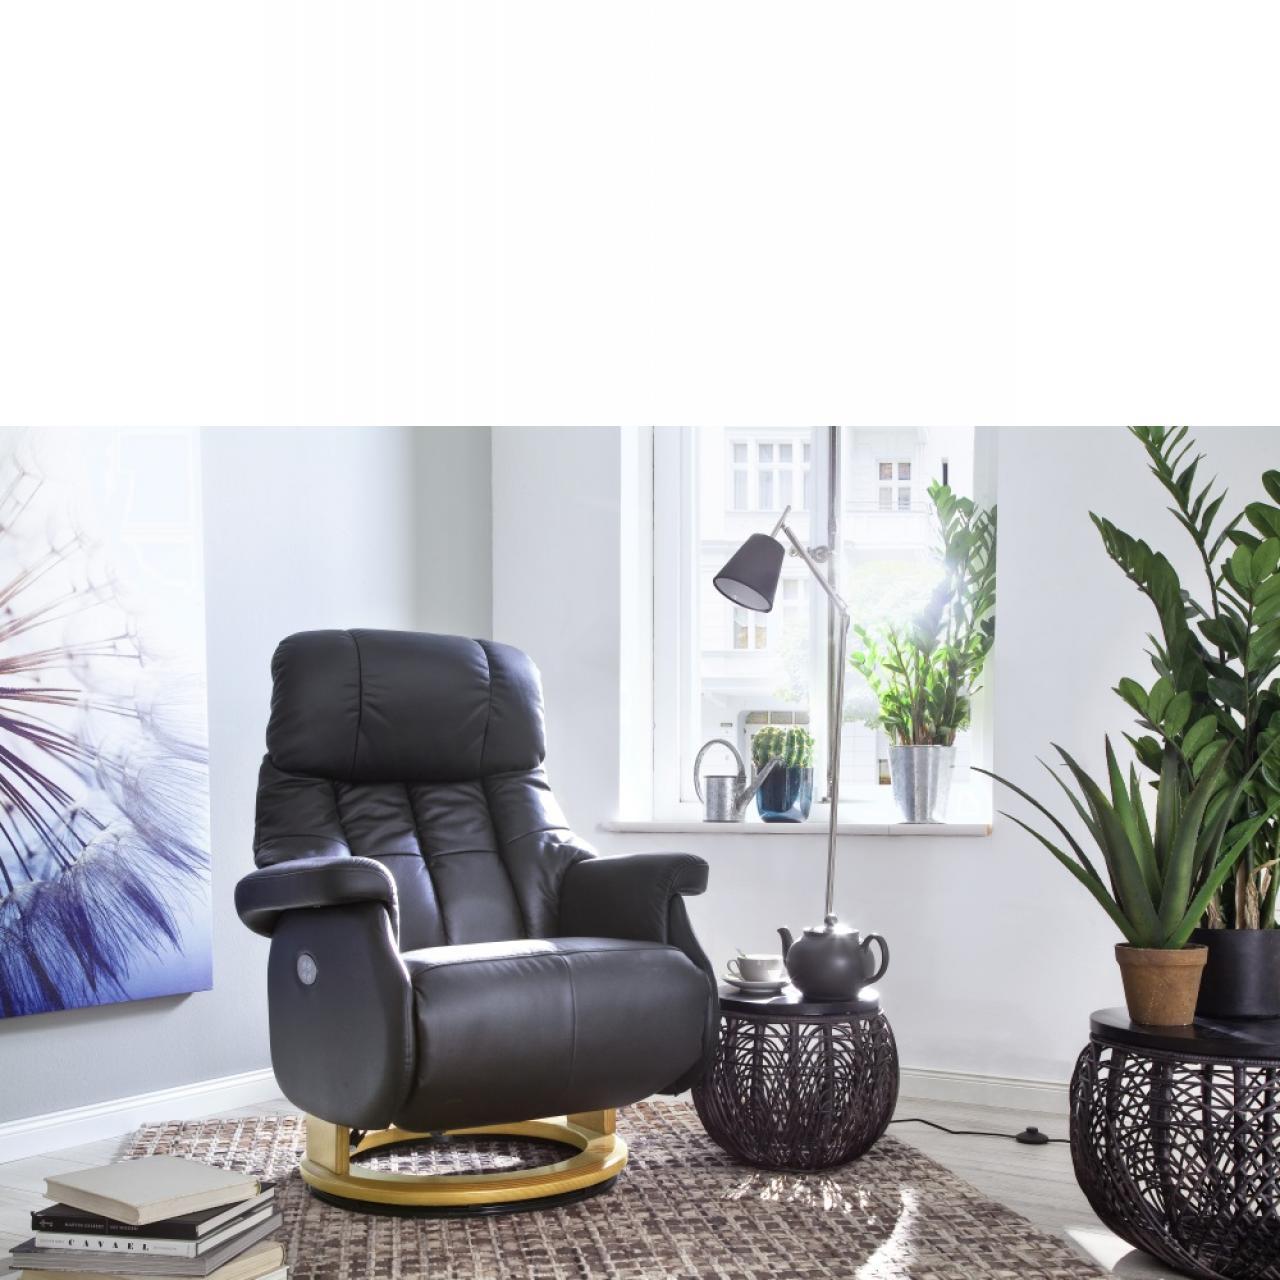 calgary comfort xl 64037sn5 sessel polsterm bel m bel j hnichen center gmbh. Black Bedroom Furniture Sets. Home Design Ideas